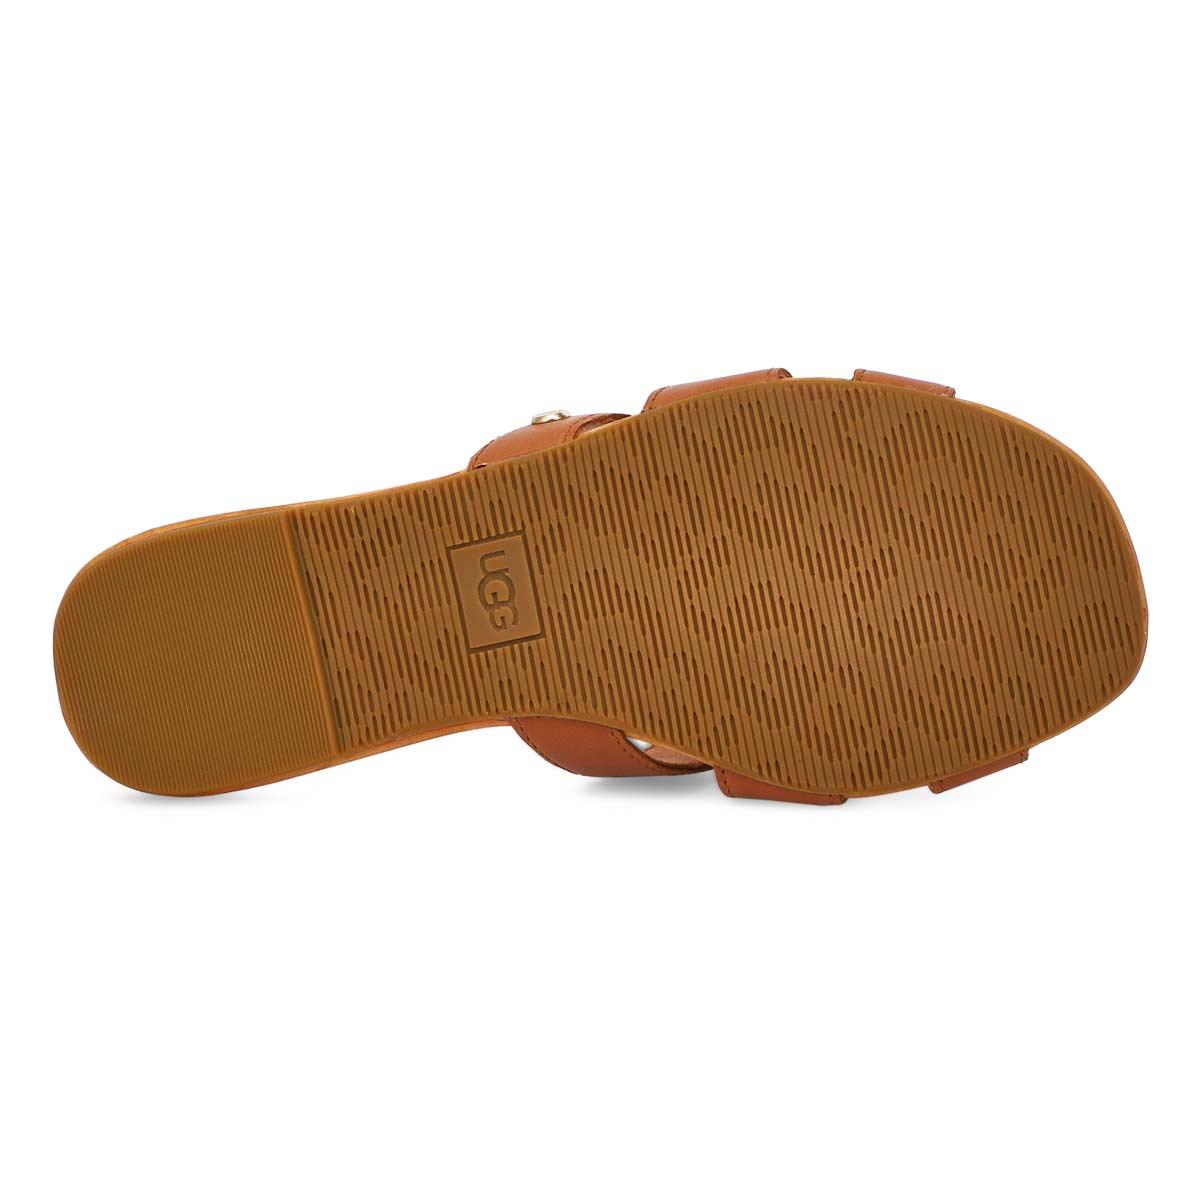 Women's Teague Slide Sandal - Tan